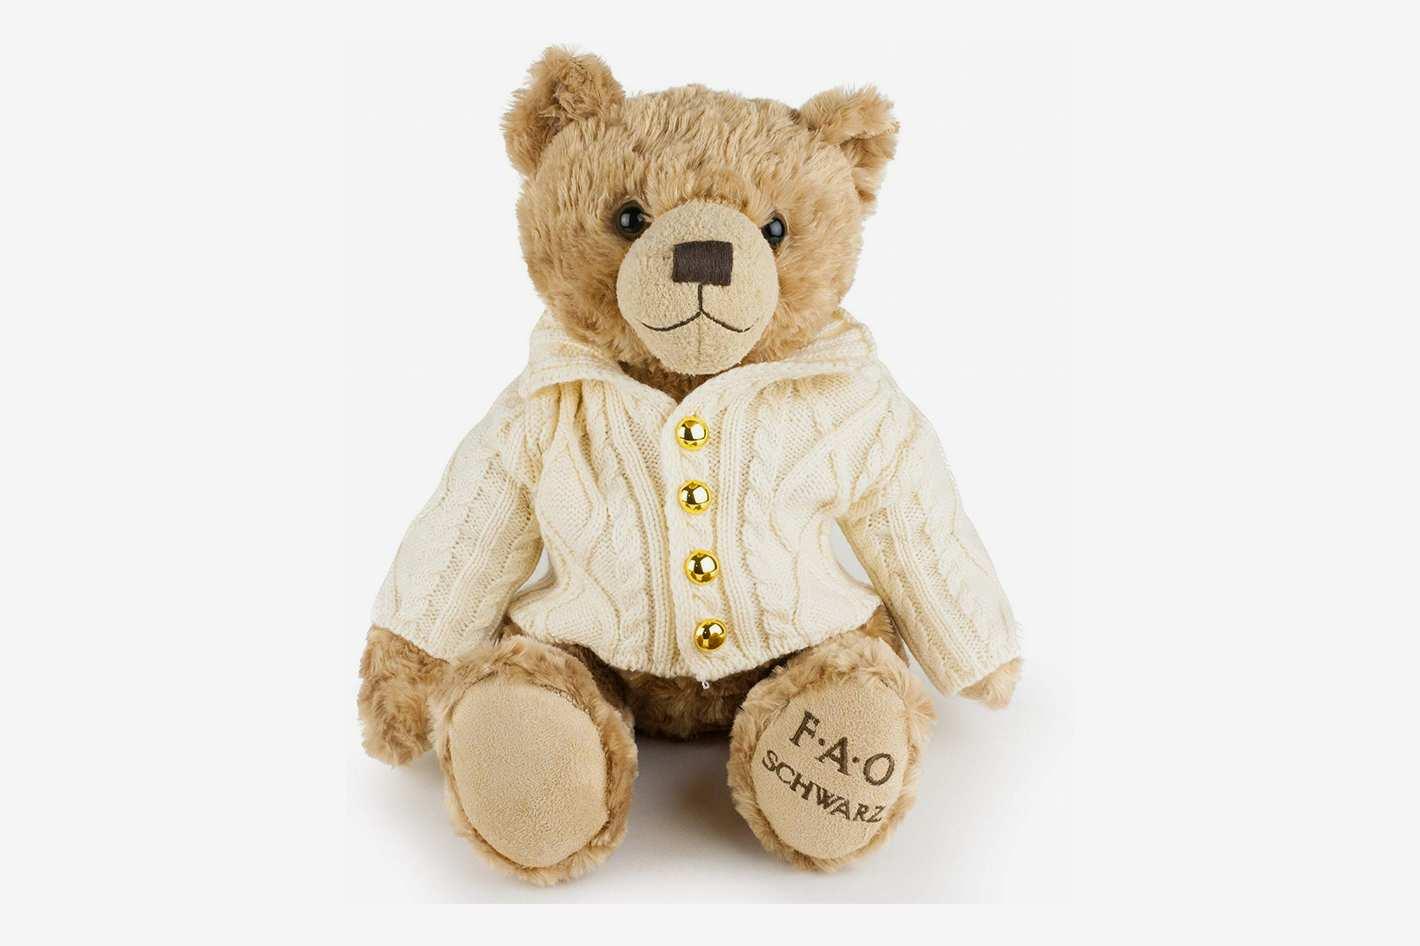 FAO Schwarz Original Classic Stuffed Teddy Bear